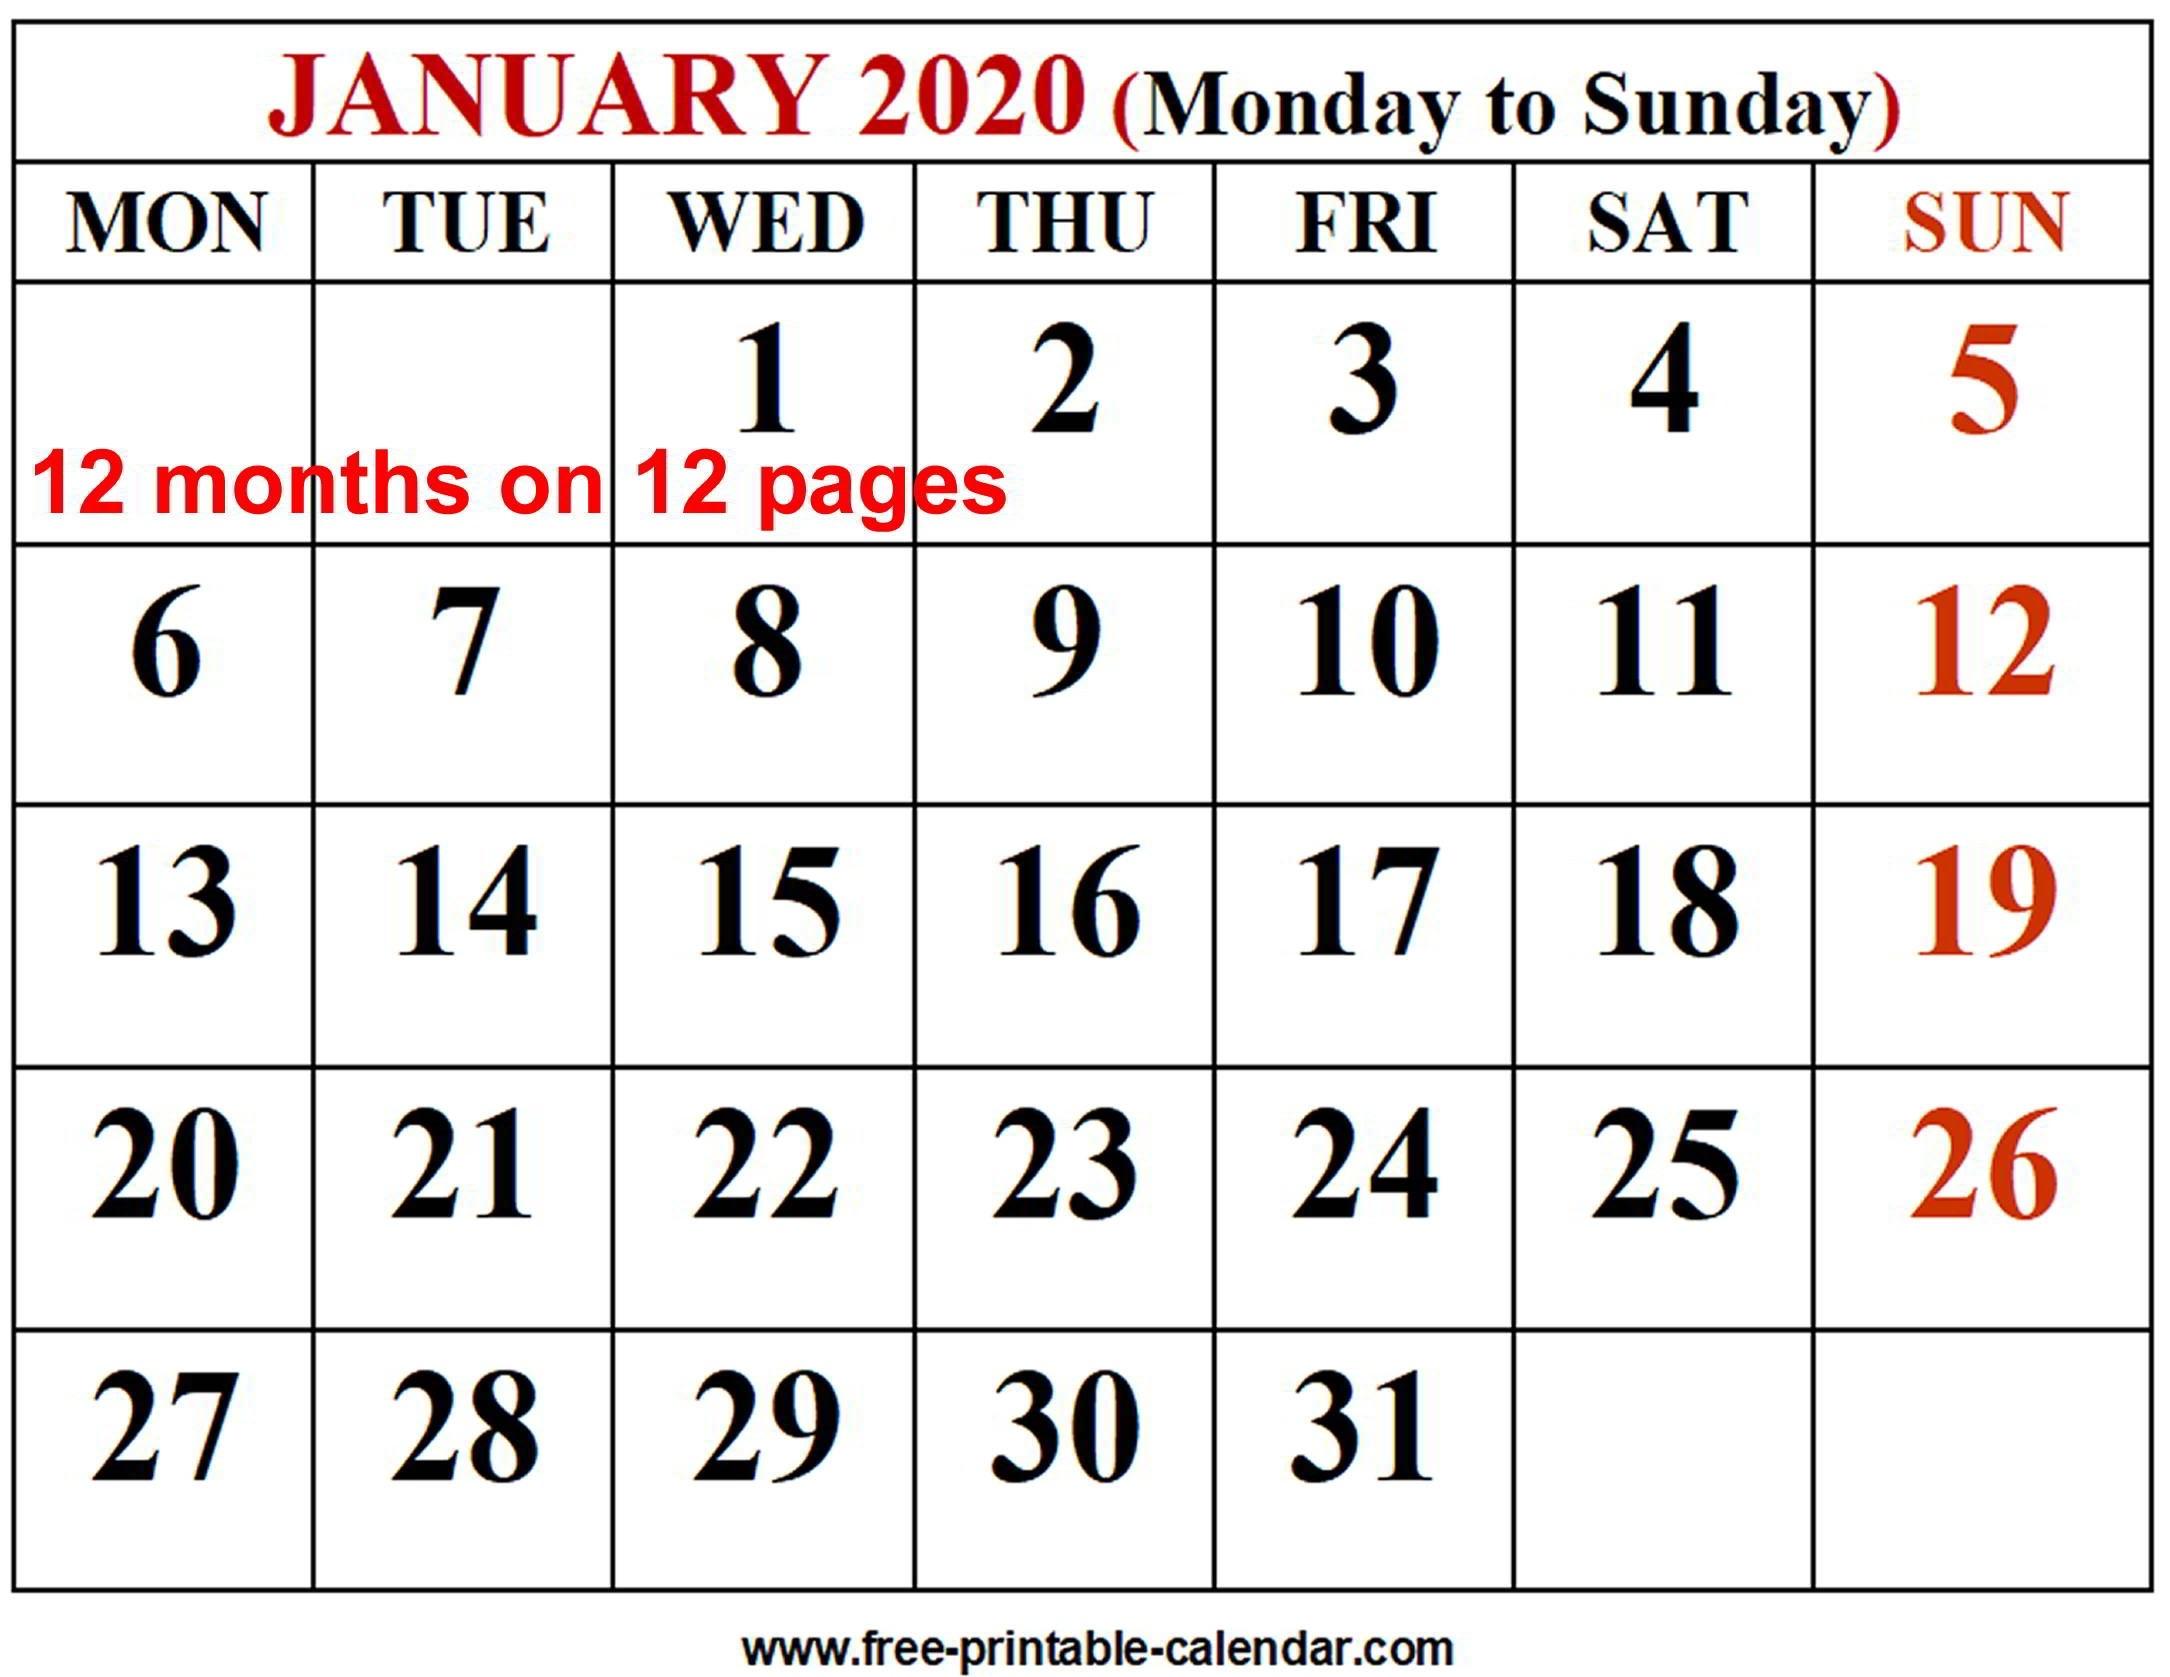 2020 Calendar Template - Free-Printable-Calendar-Monthly Print Calendars Templates 2020 Multiple Months Per Page